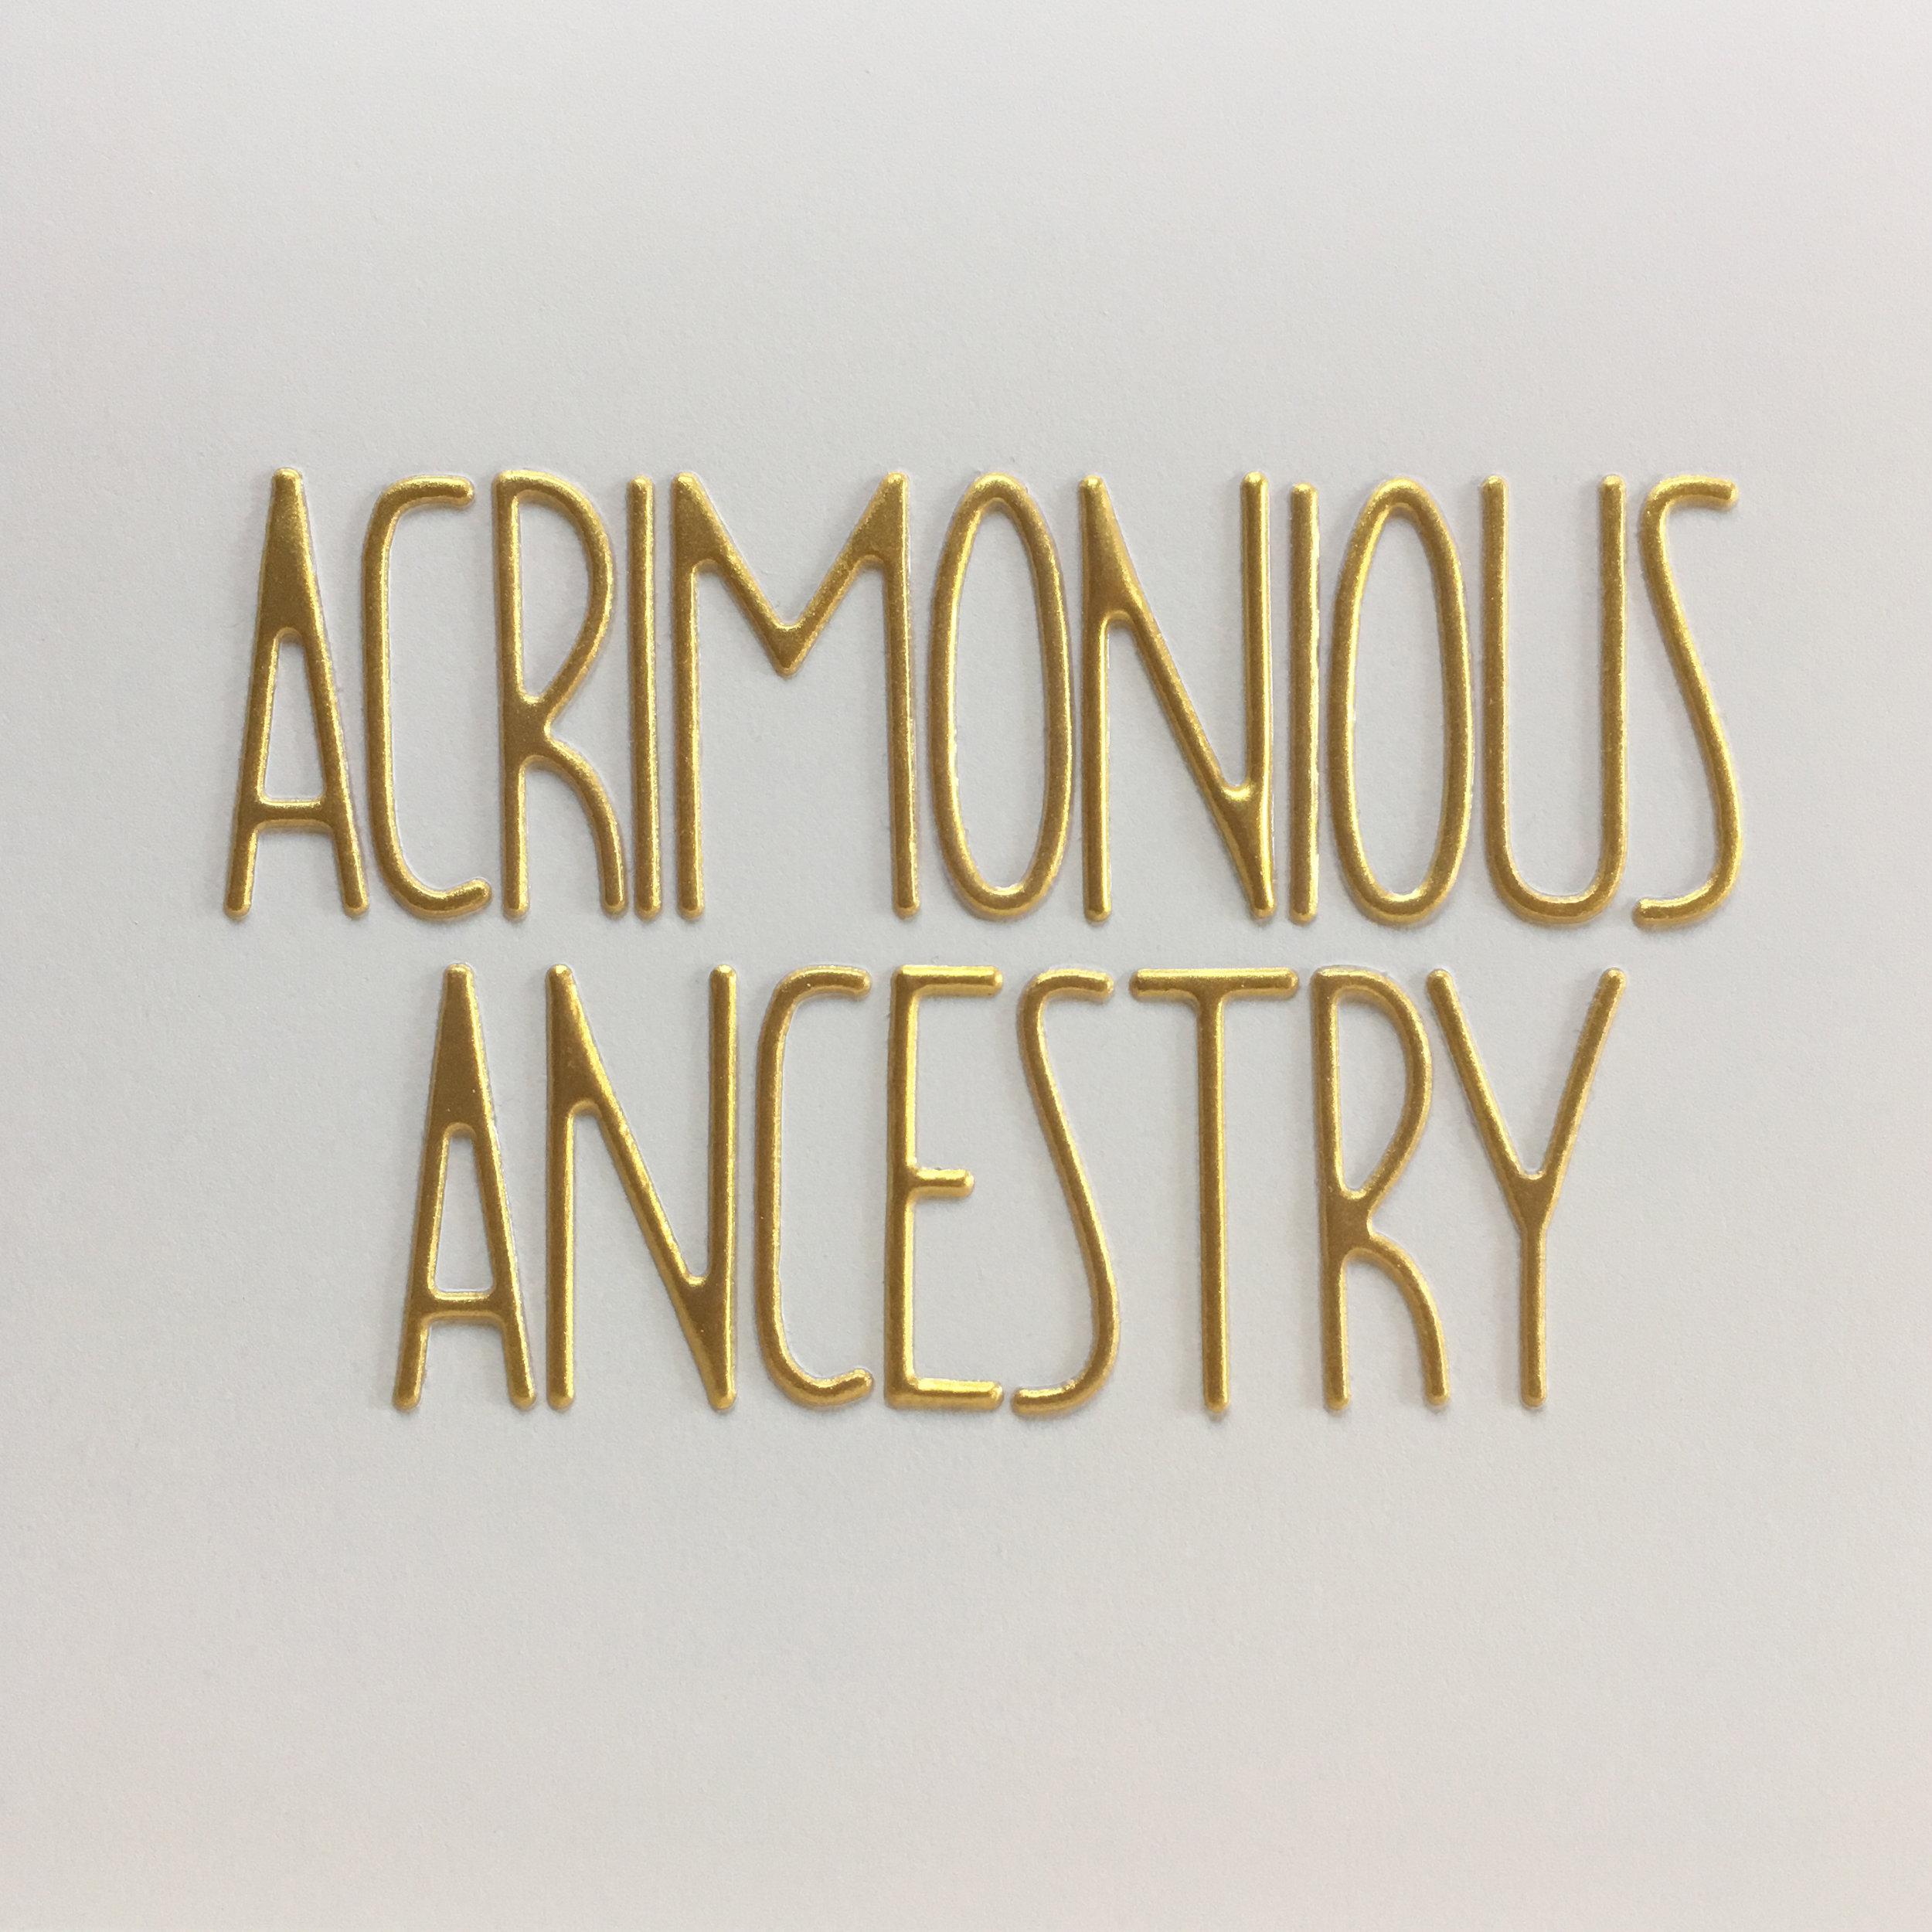 acrimonious ancestry.jpg